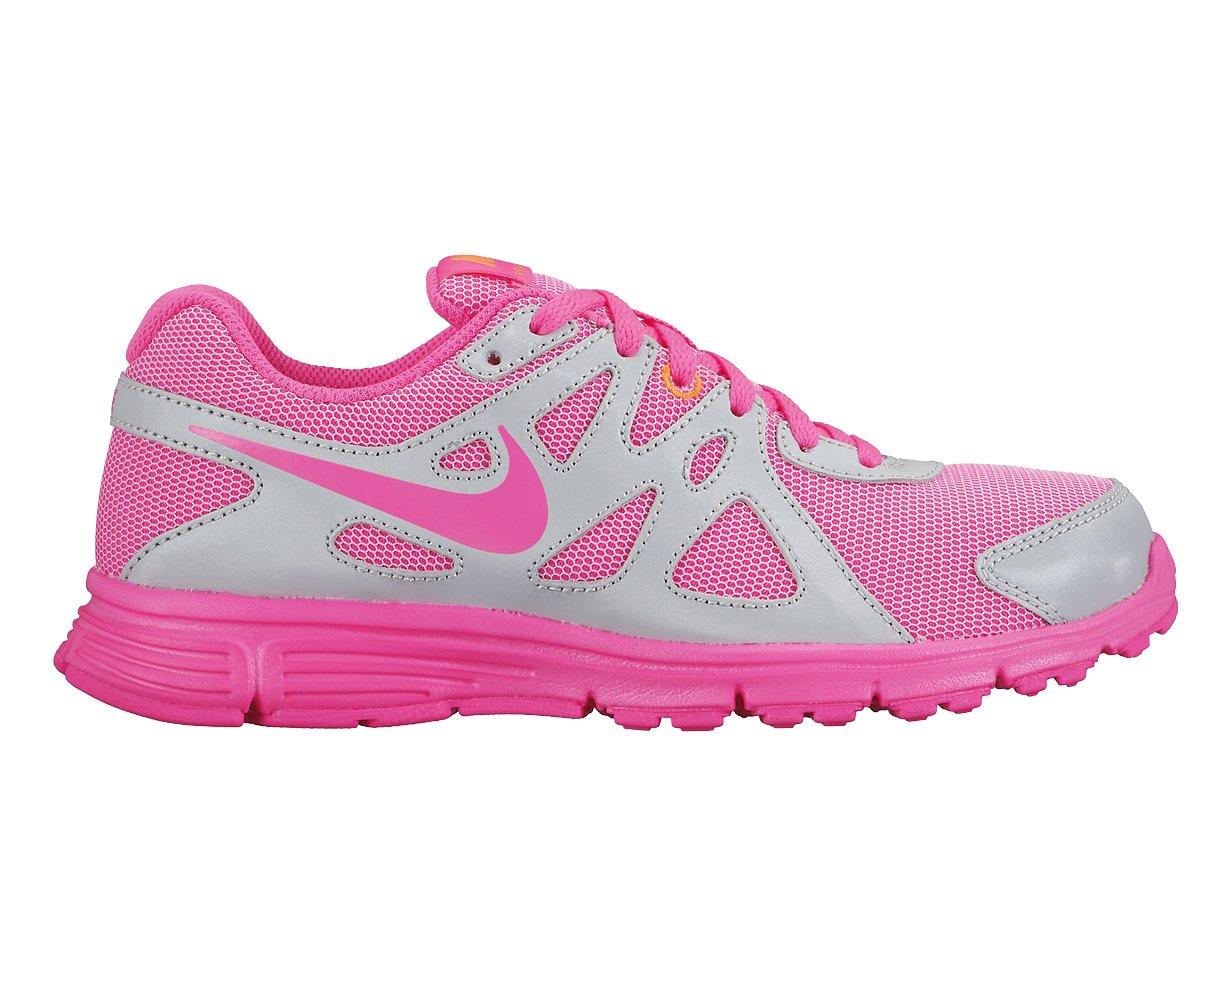 Nike Girls Revolution II Running Shoes-Metallic Plantinum/Pink Power-5.5 by NIKE (Image #1)